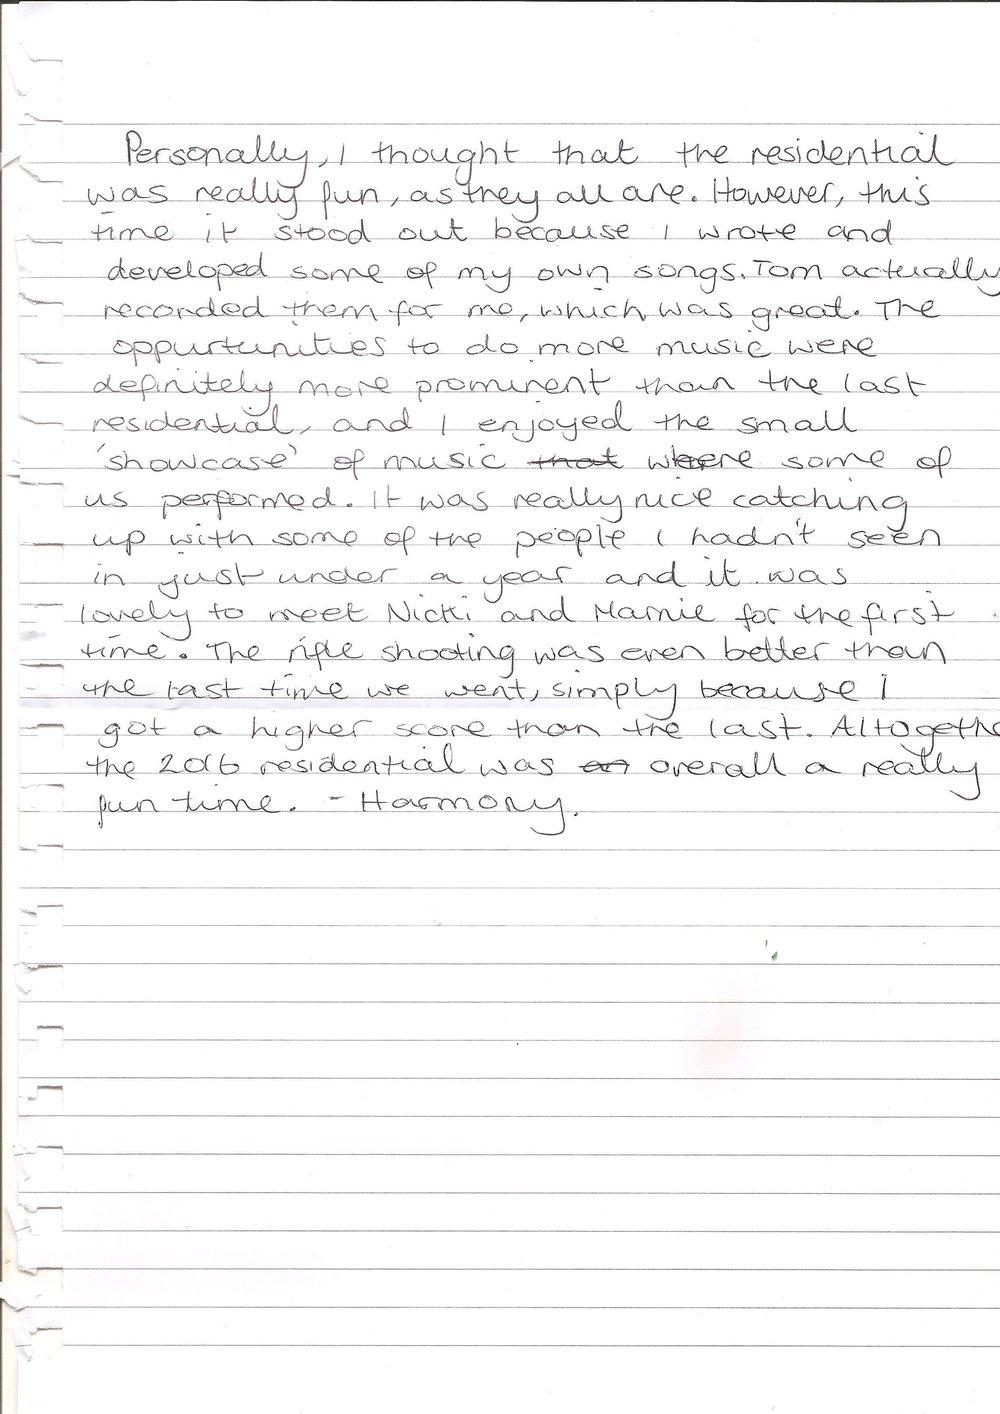 testimonial2-page-001.jpg